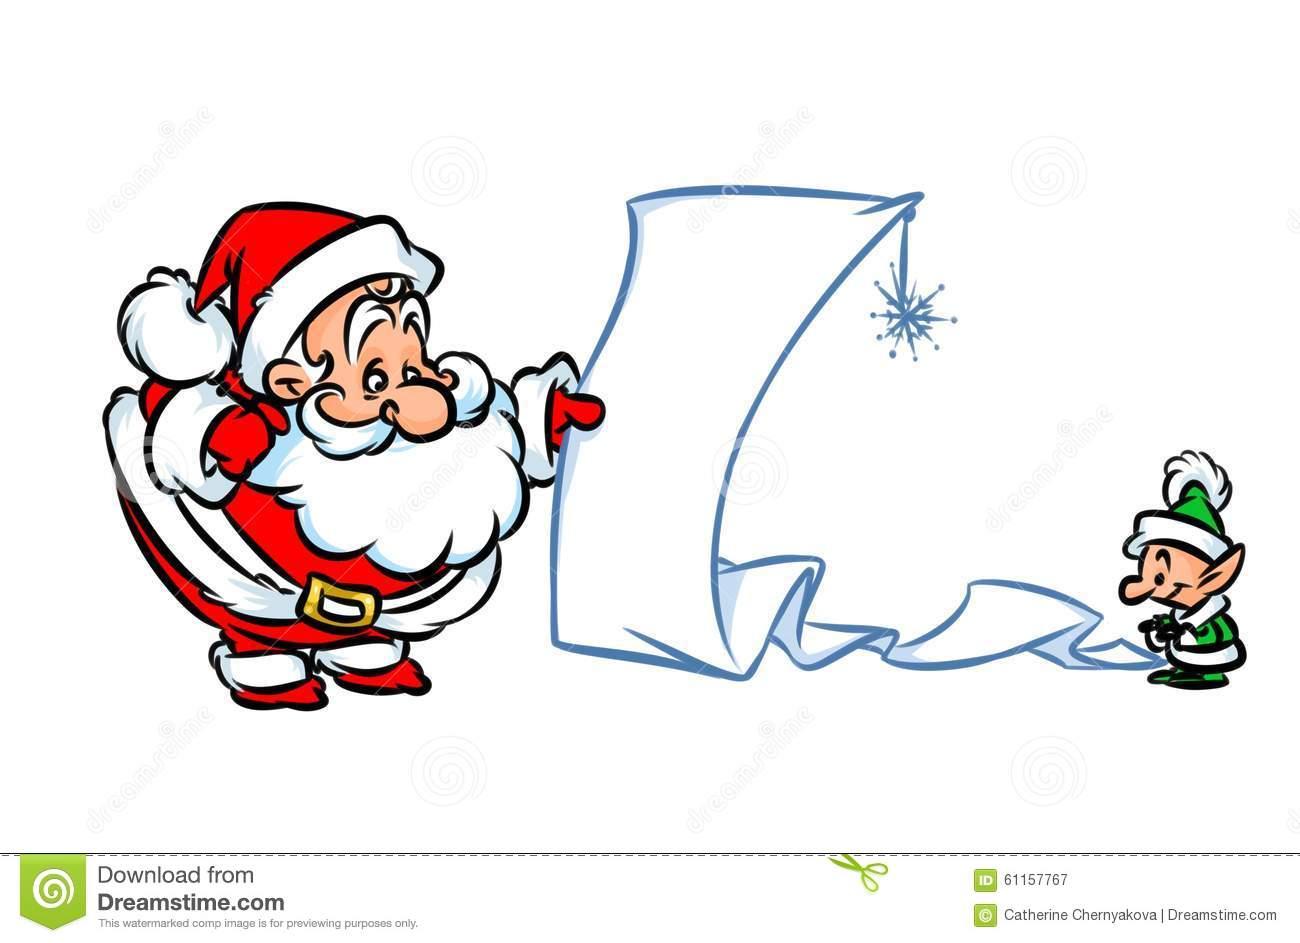 Santa list clipart freeuse library Santa Claus Holiday Gift List Cartoon Illustration Stock ... freeuse library